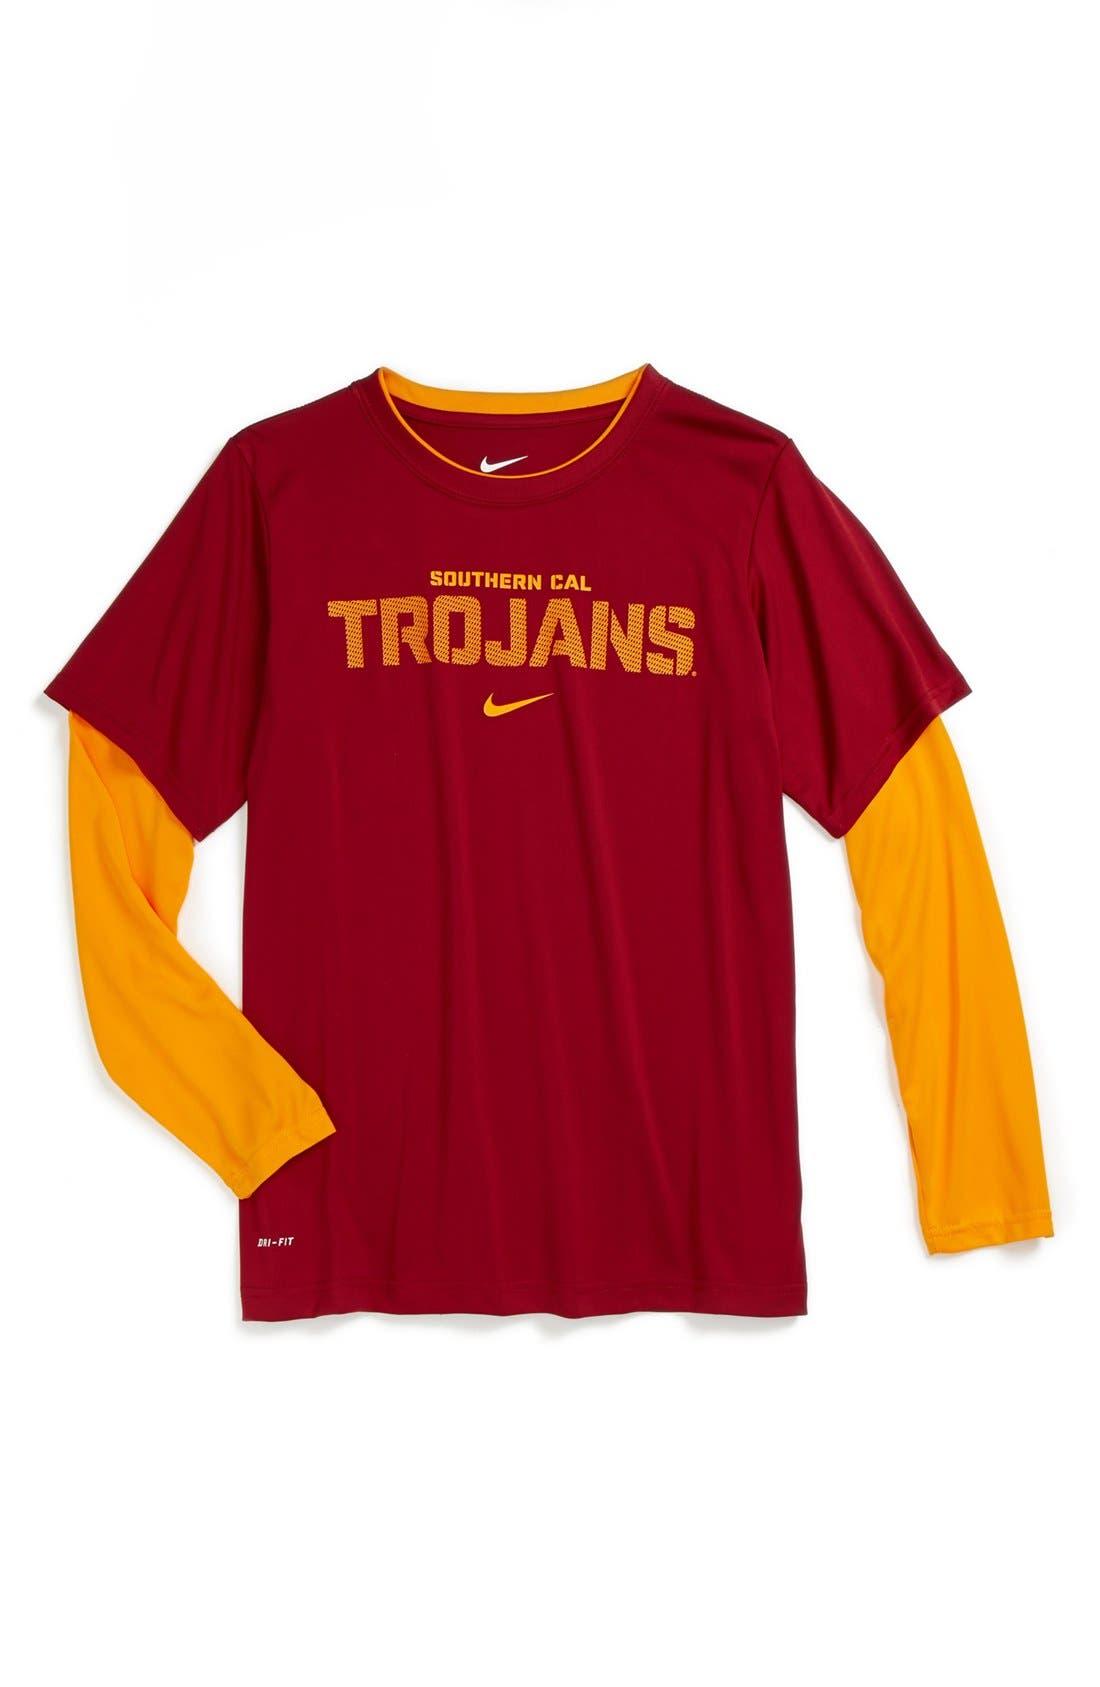 Alternate Image 1 Selected - Nike 'Southern California Trojans' Dri-FIT Layered Sleeve Sport T-Shirt (Big Boys)